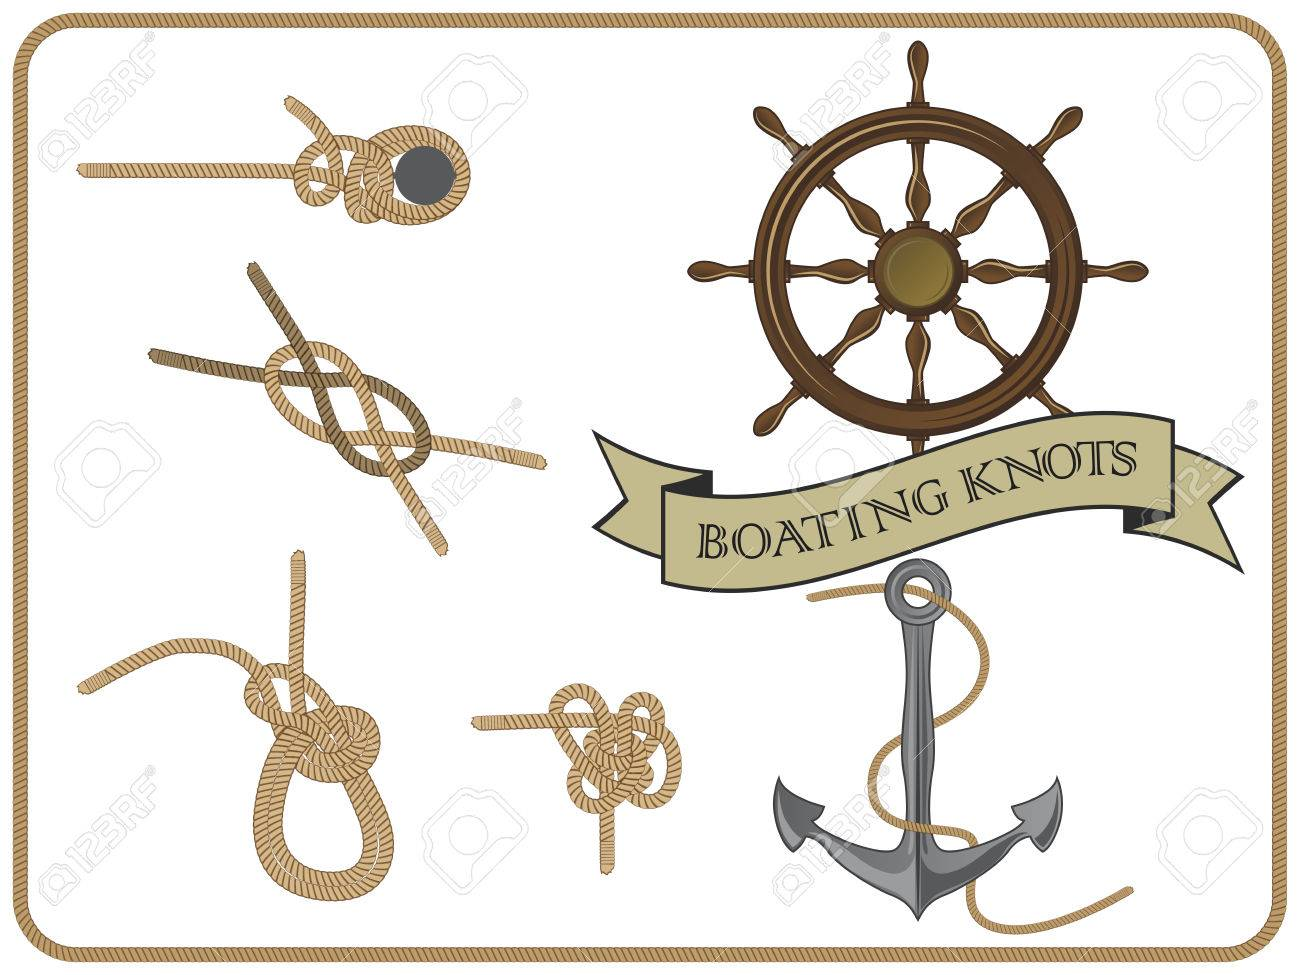 isolated set of boating knots on white background - 74189690